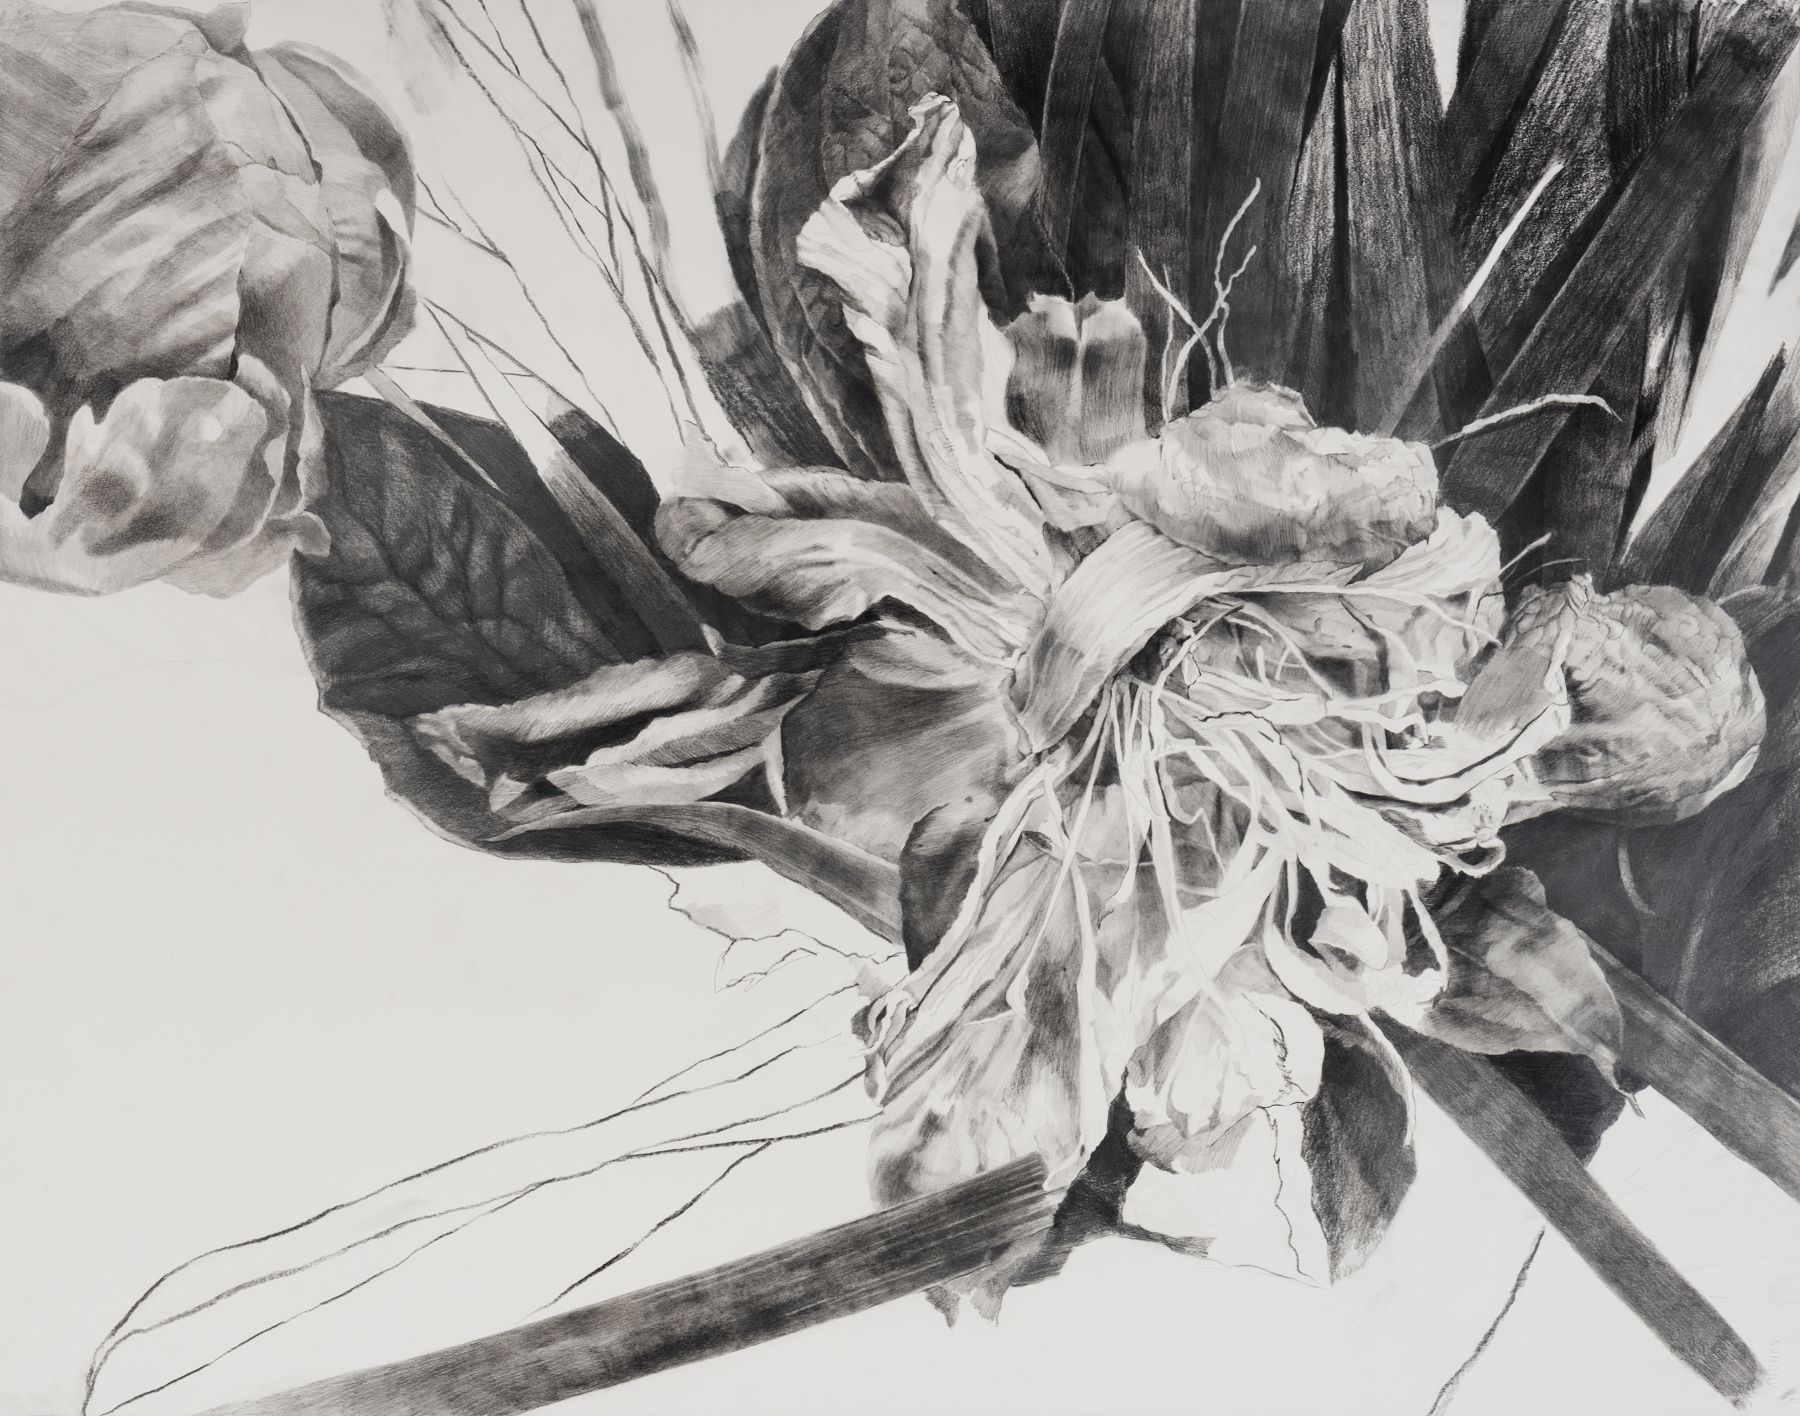 Dead Flowers 2, graphite on paper, 25 3/4 x 32 1/2 in, JR038